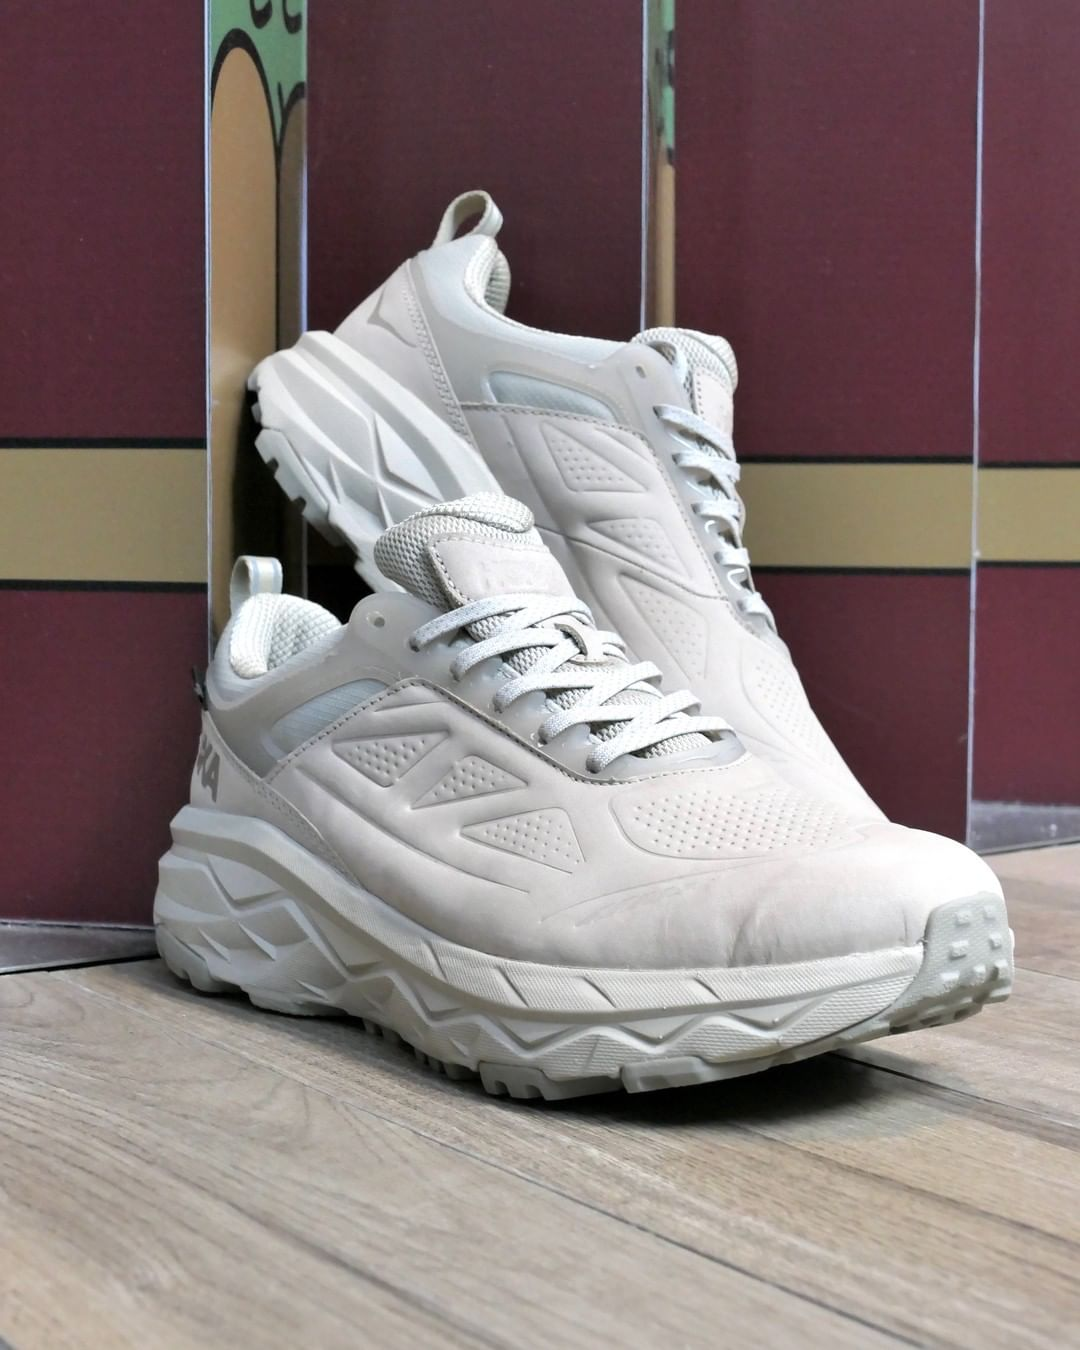 HOKA ONE ONE,Challenger Low,GO 搭载 GORE-TEX 科技!HOKA ONE ONE 全新山系跑鞋登场!